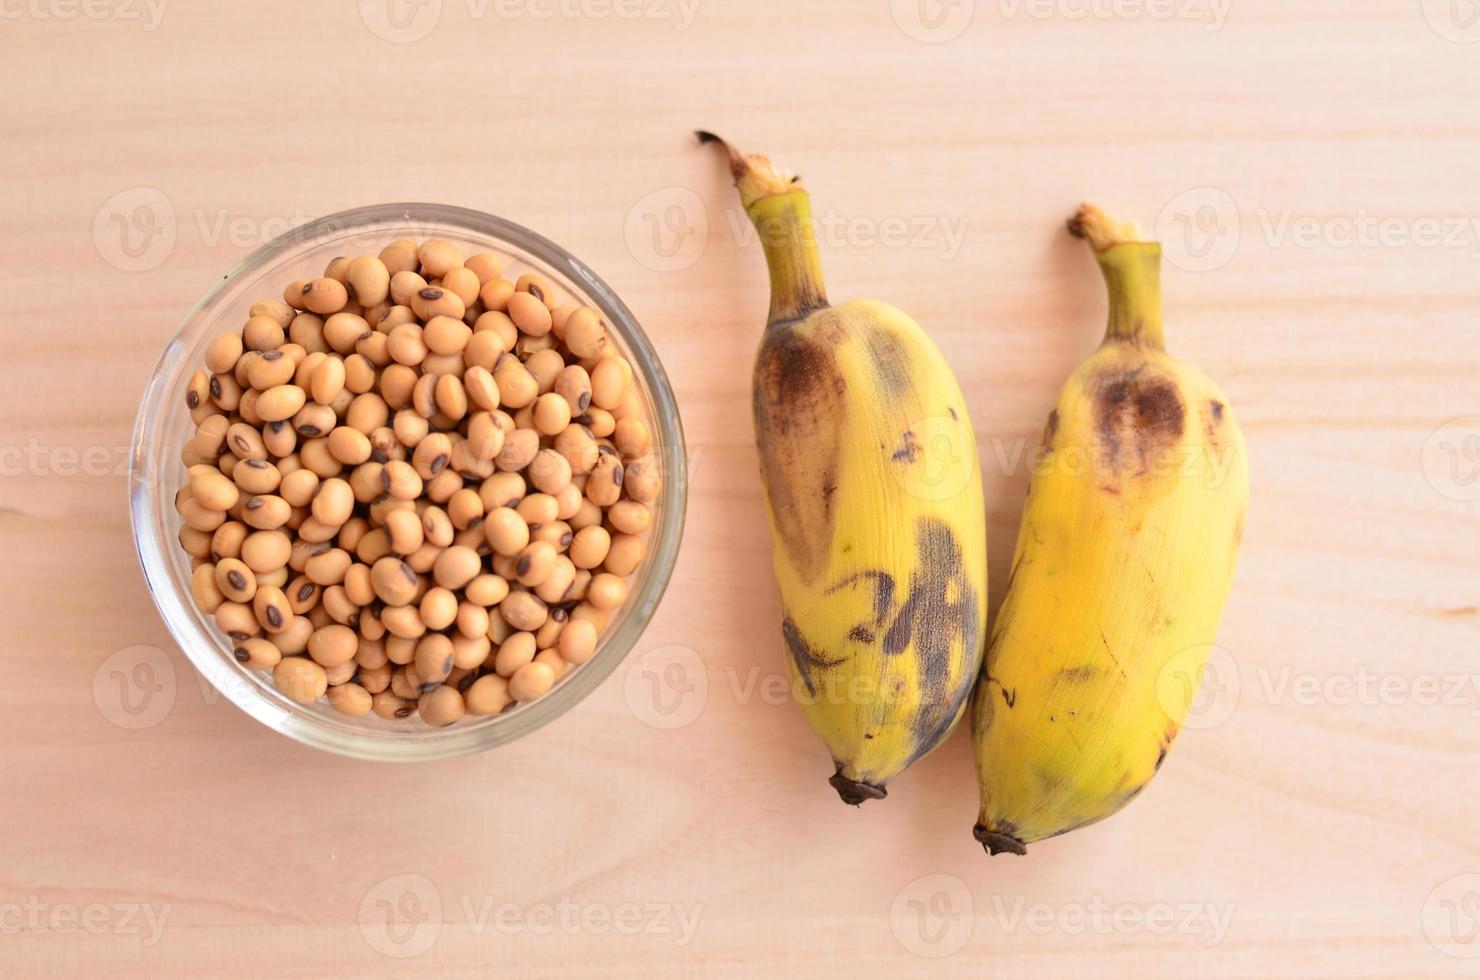 fruit de banane photo